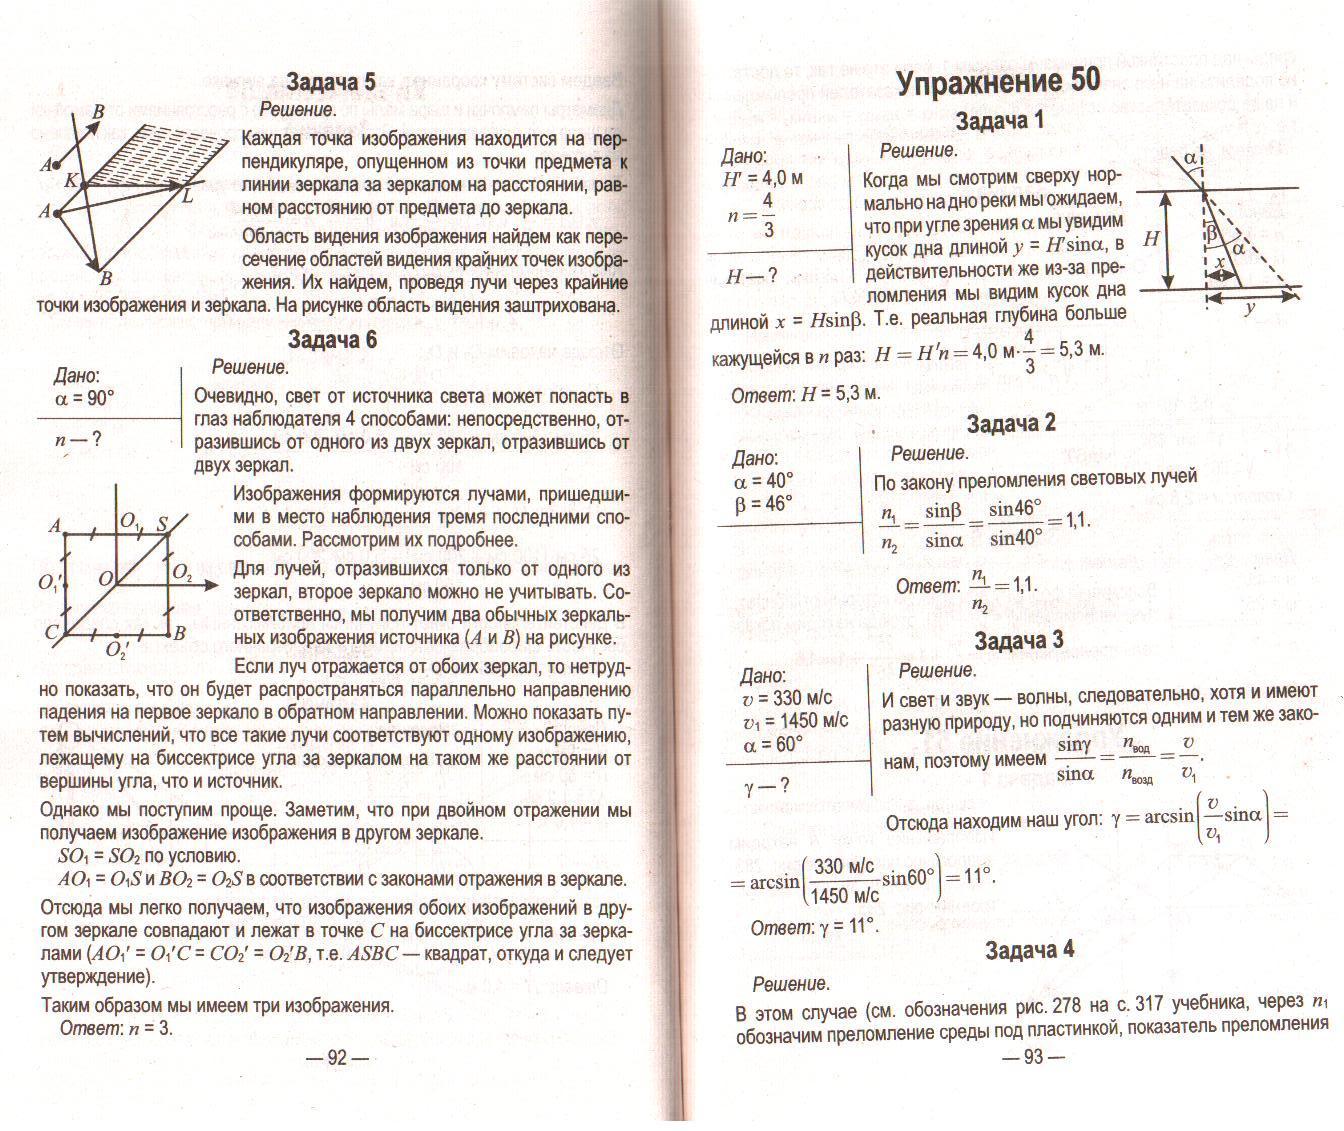 Решебник по физике 10 класс. Страницы 7